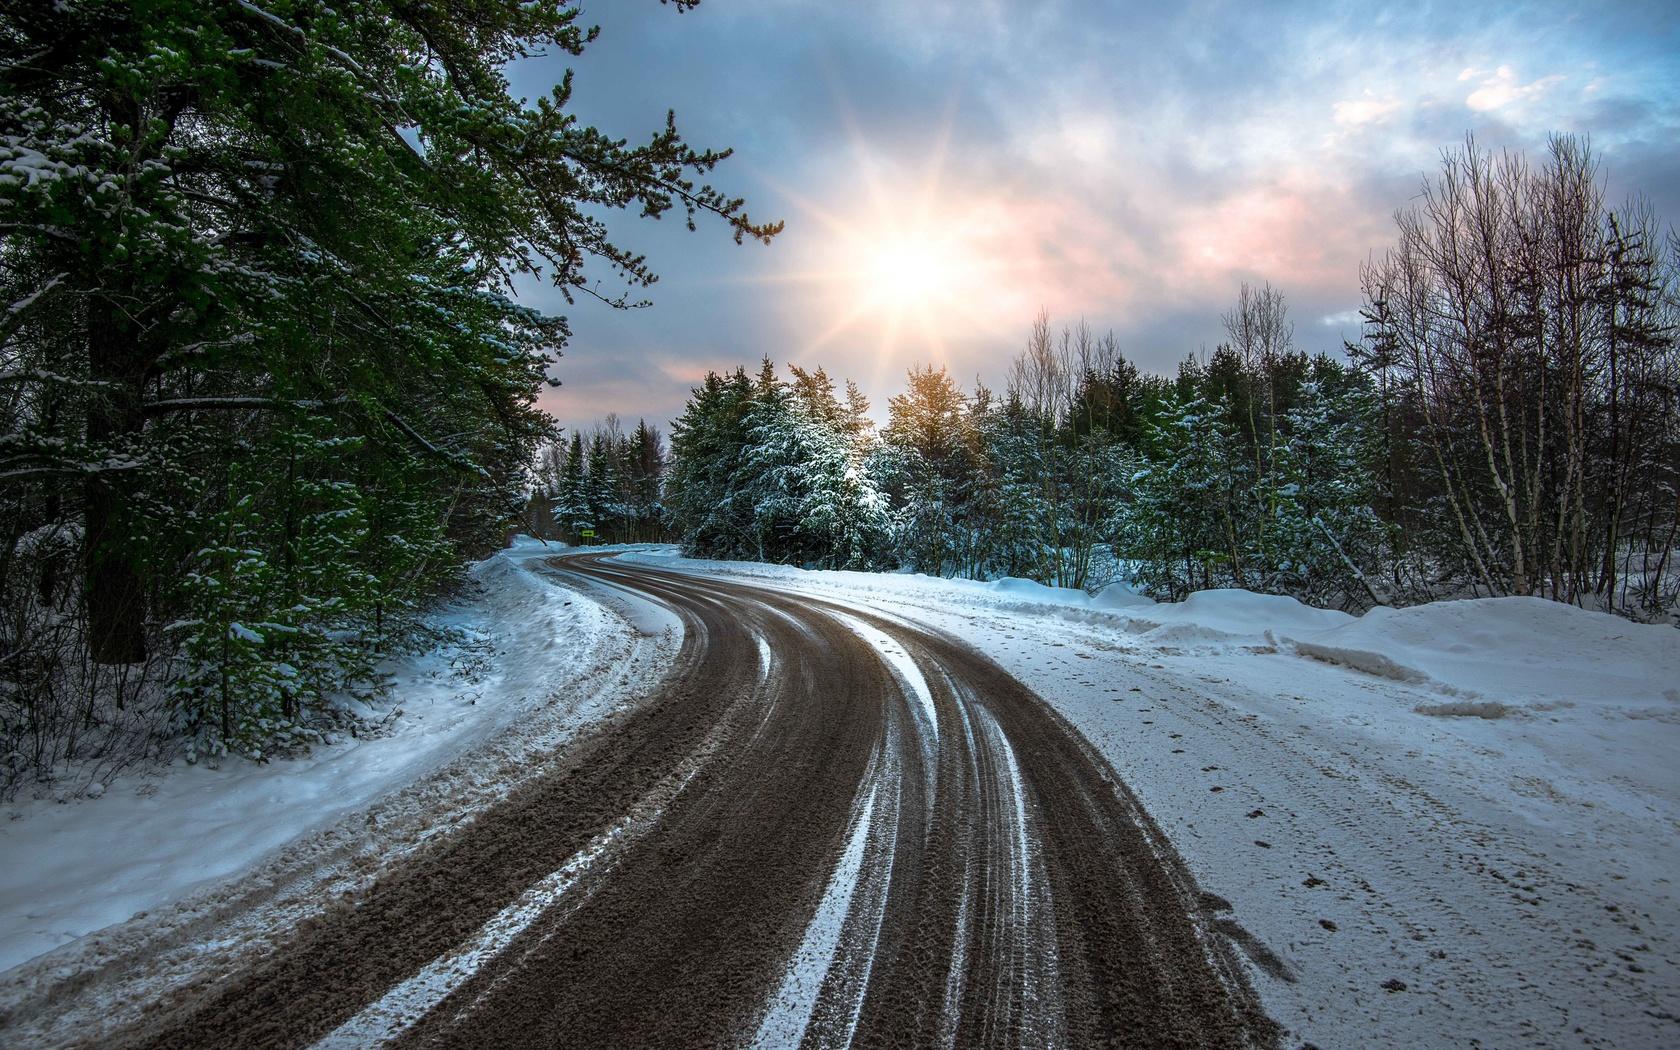 снег на дороге картинки считал людей своей